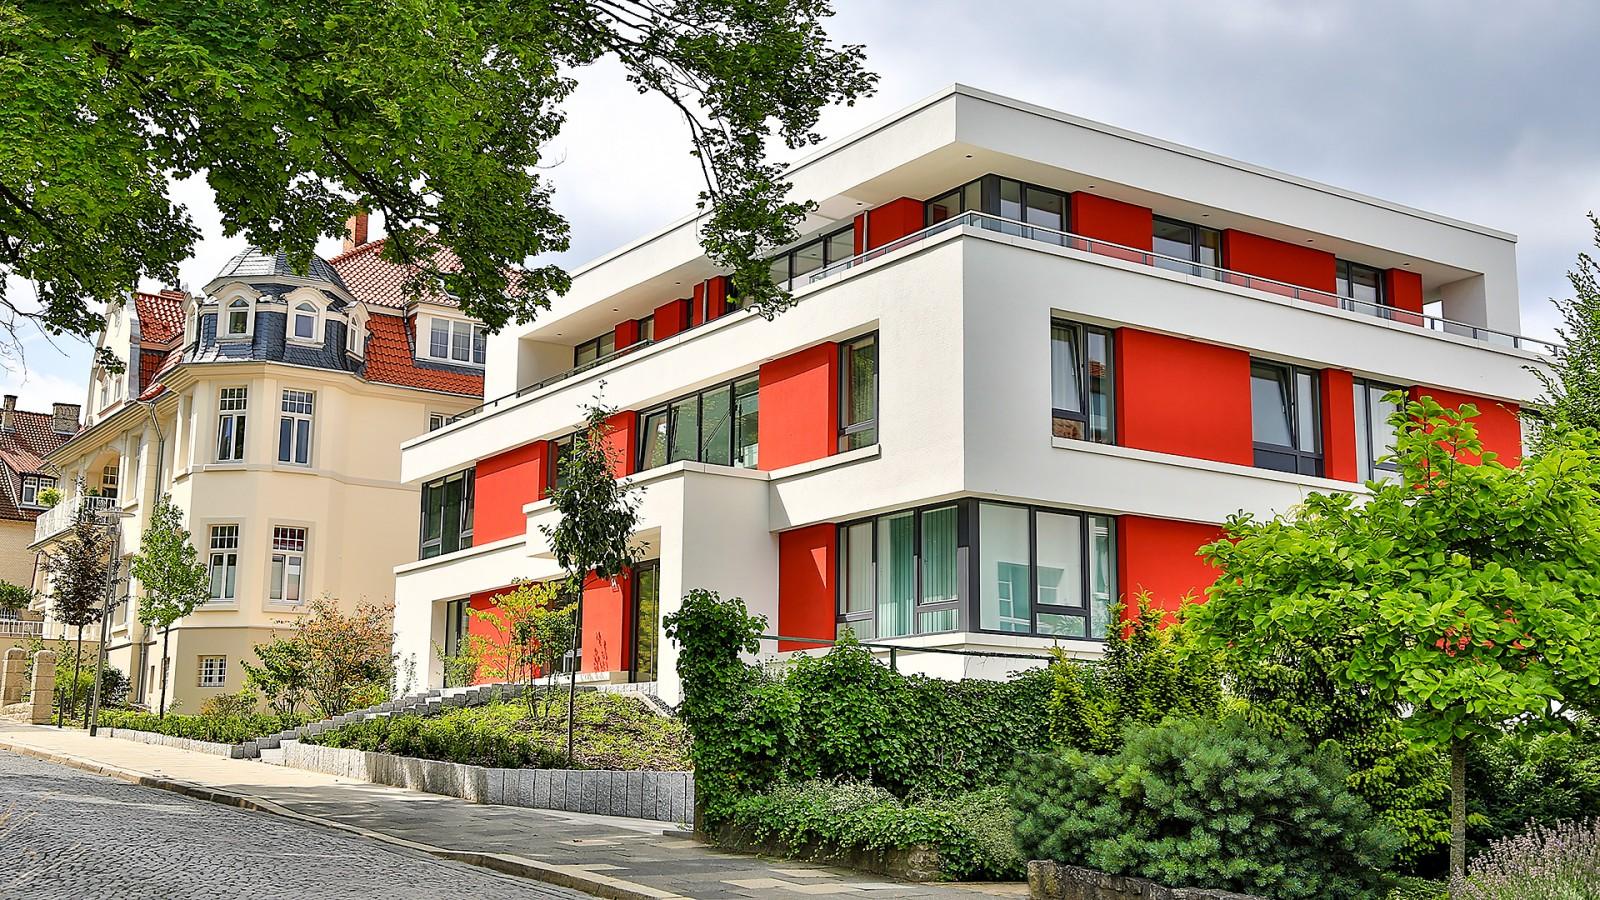 Neubau mehrfamilienhaus in hildesheim jung for Mehrfamilienhaus modern